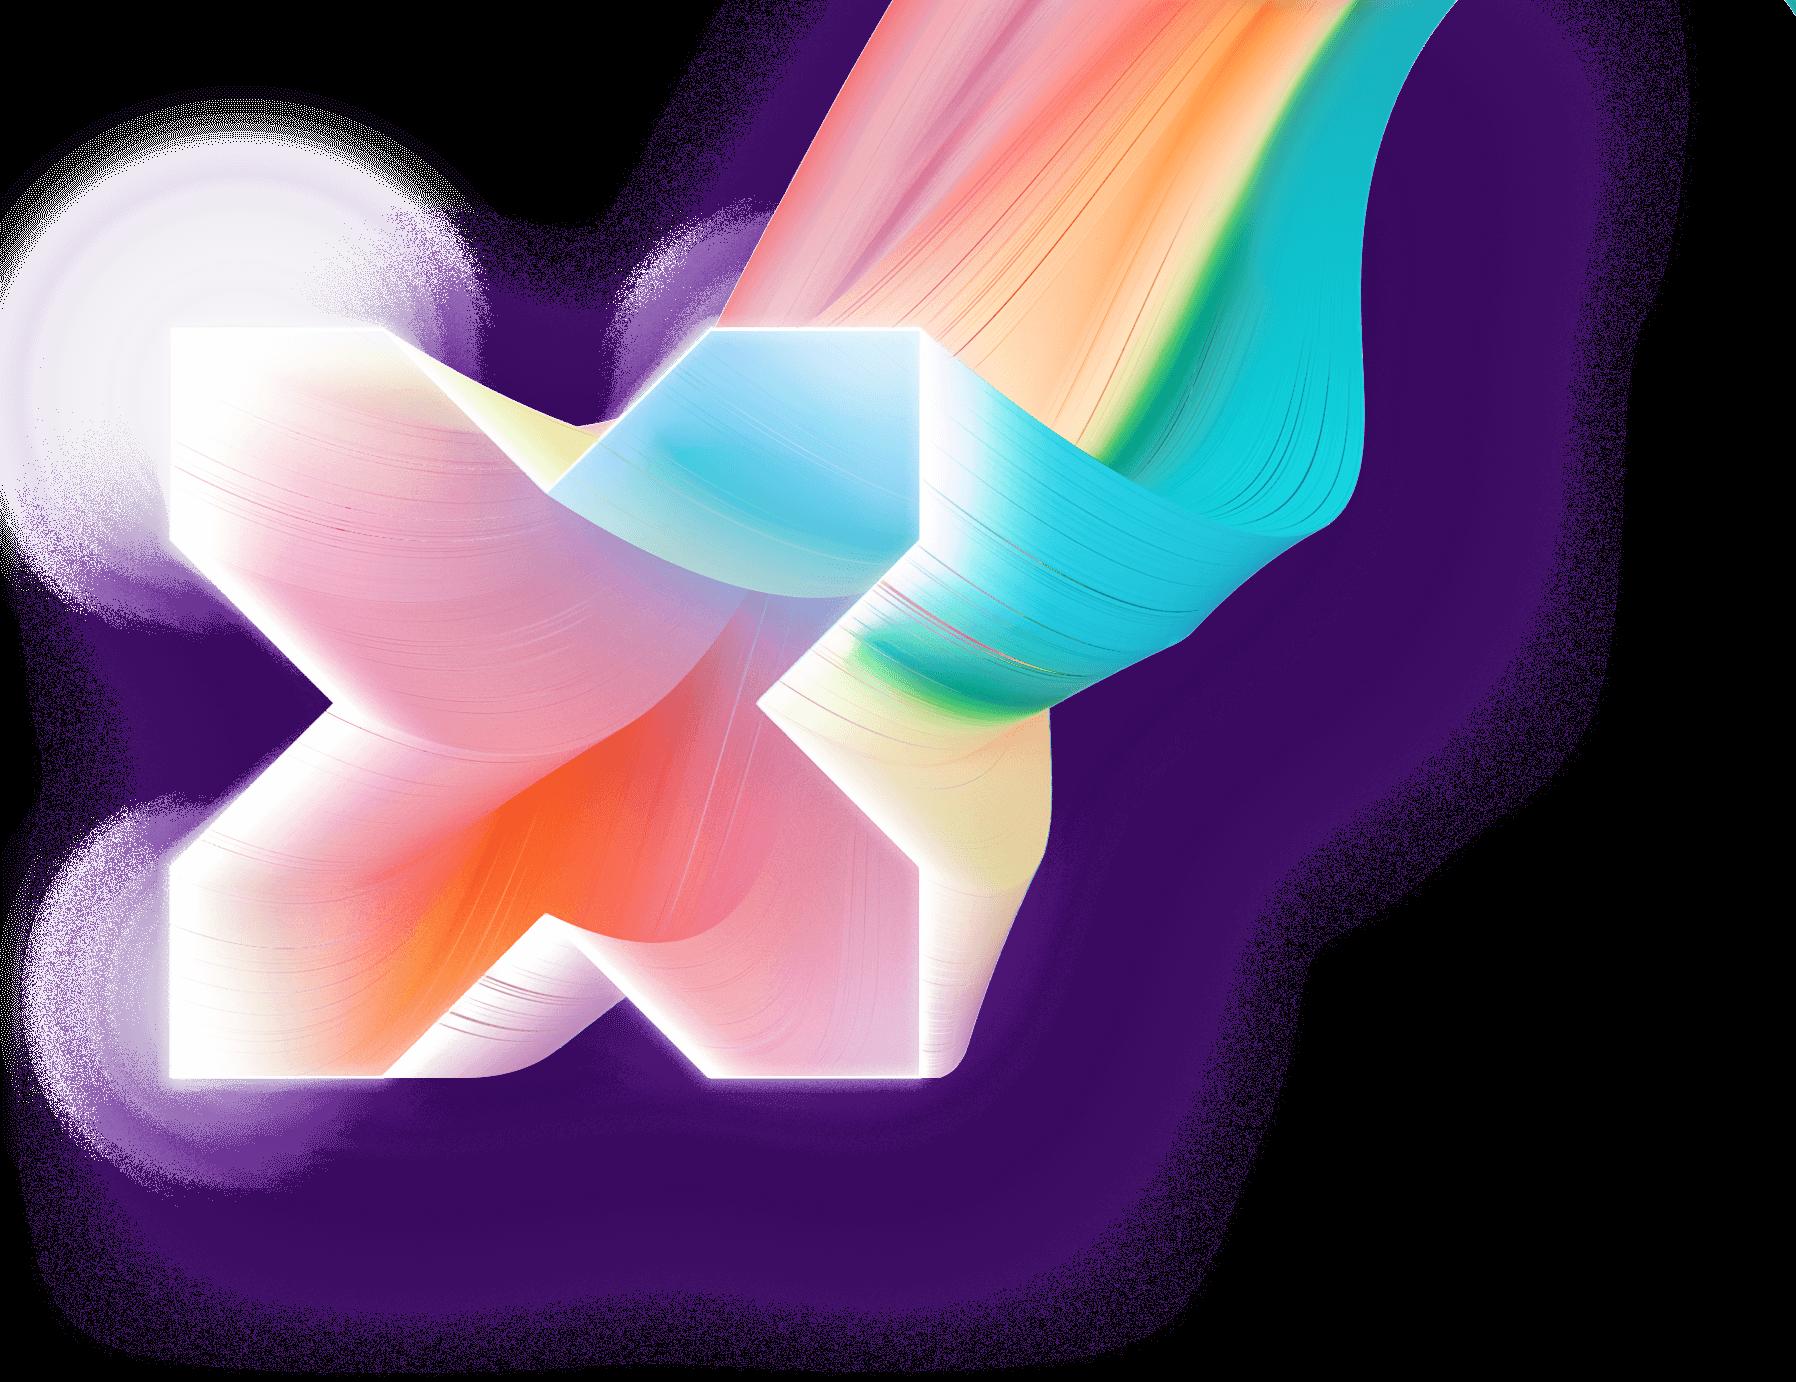 Logo Festival X 2019 - Brisbane, Sydney, Melbourne Music Festival